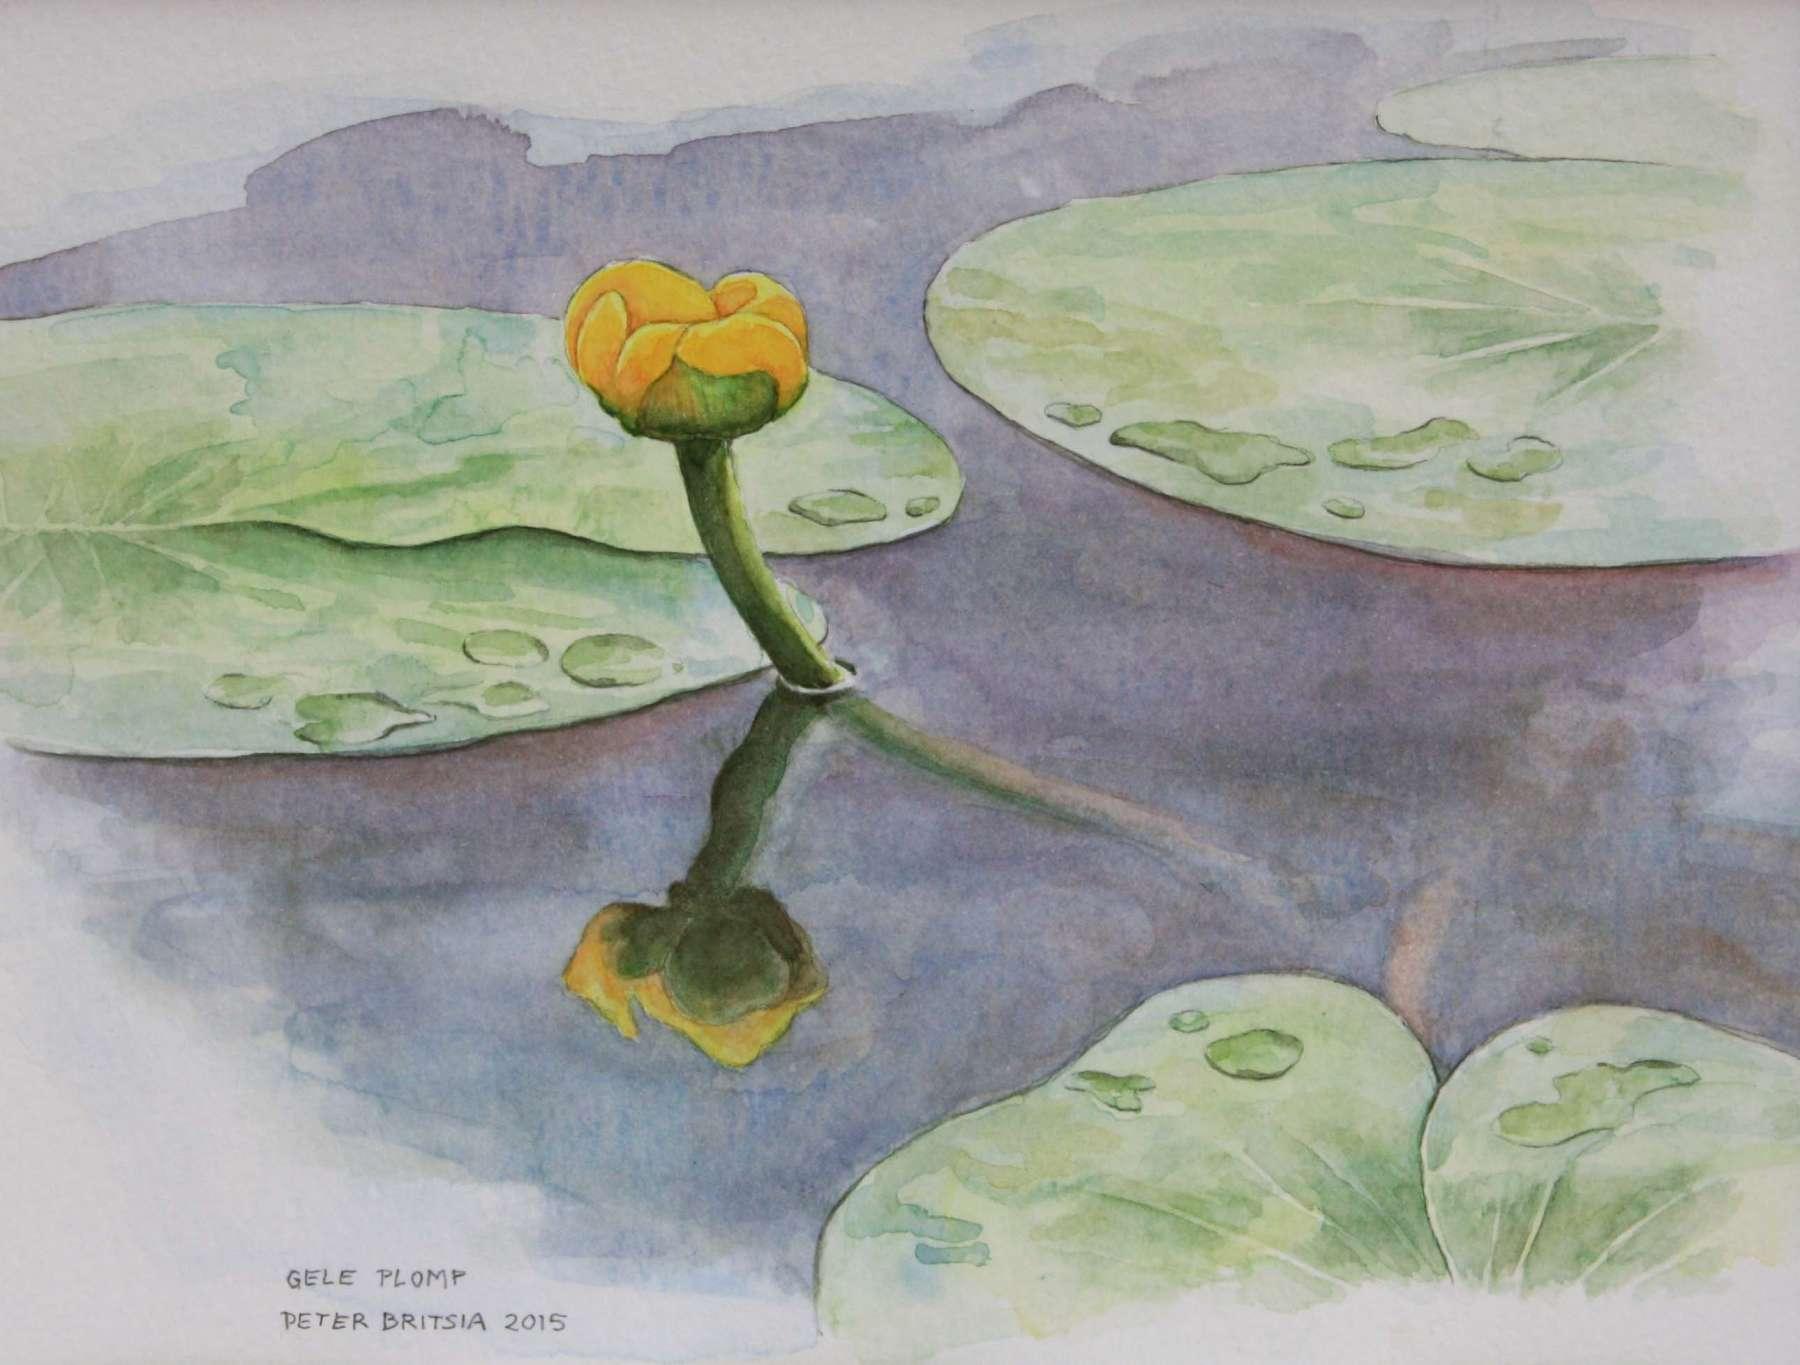 Gele plomp - aquarel - 20 x 15 cm.